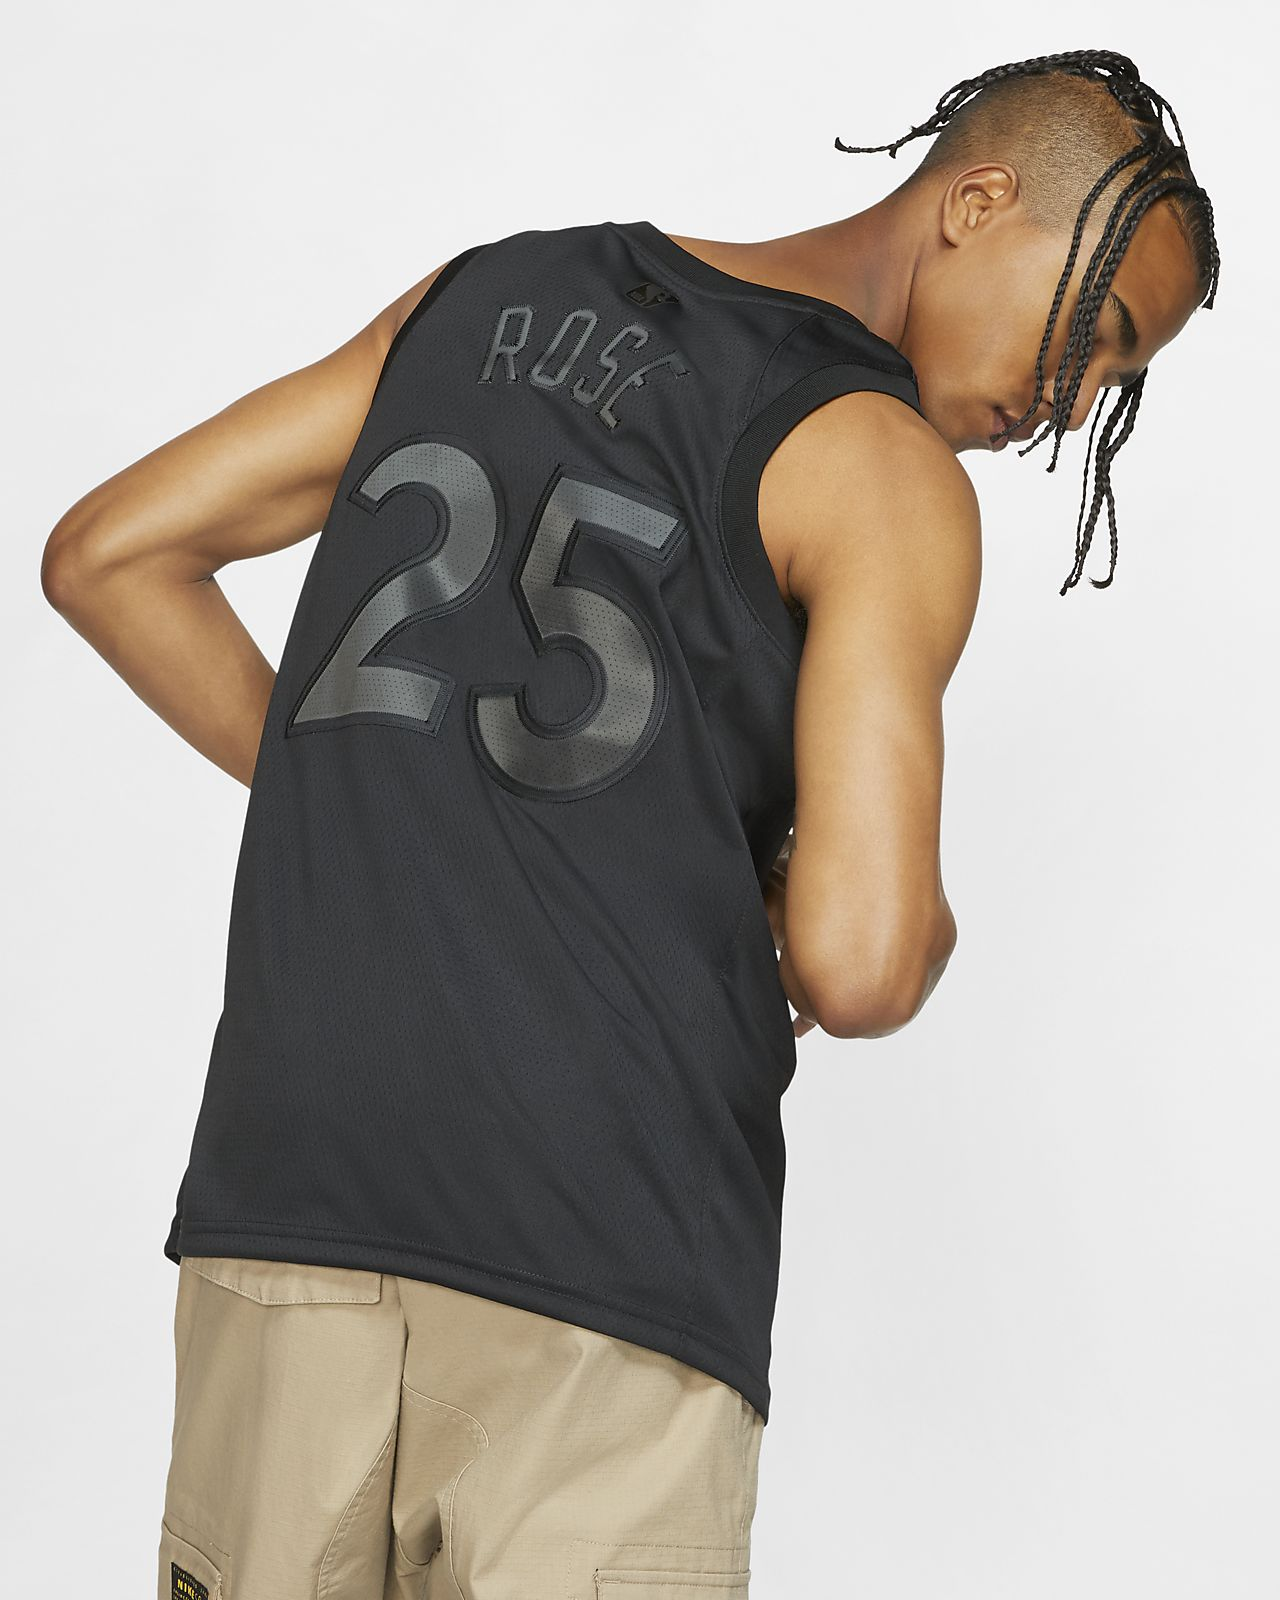 f74a915e6 ... Derrick Rose MVP Swingman (Minnesota Timberwolves) Men s Nike NBA  Connected Jersey